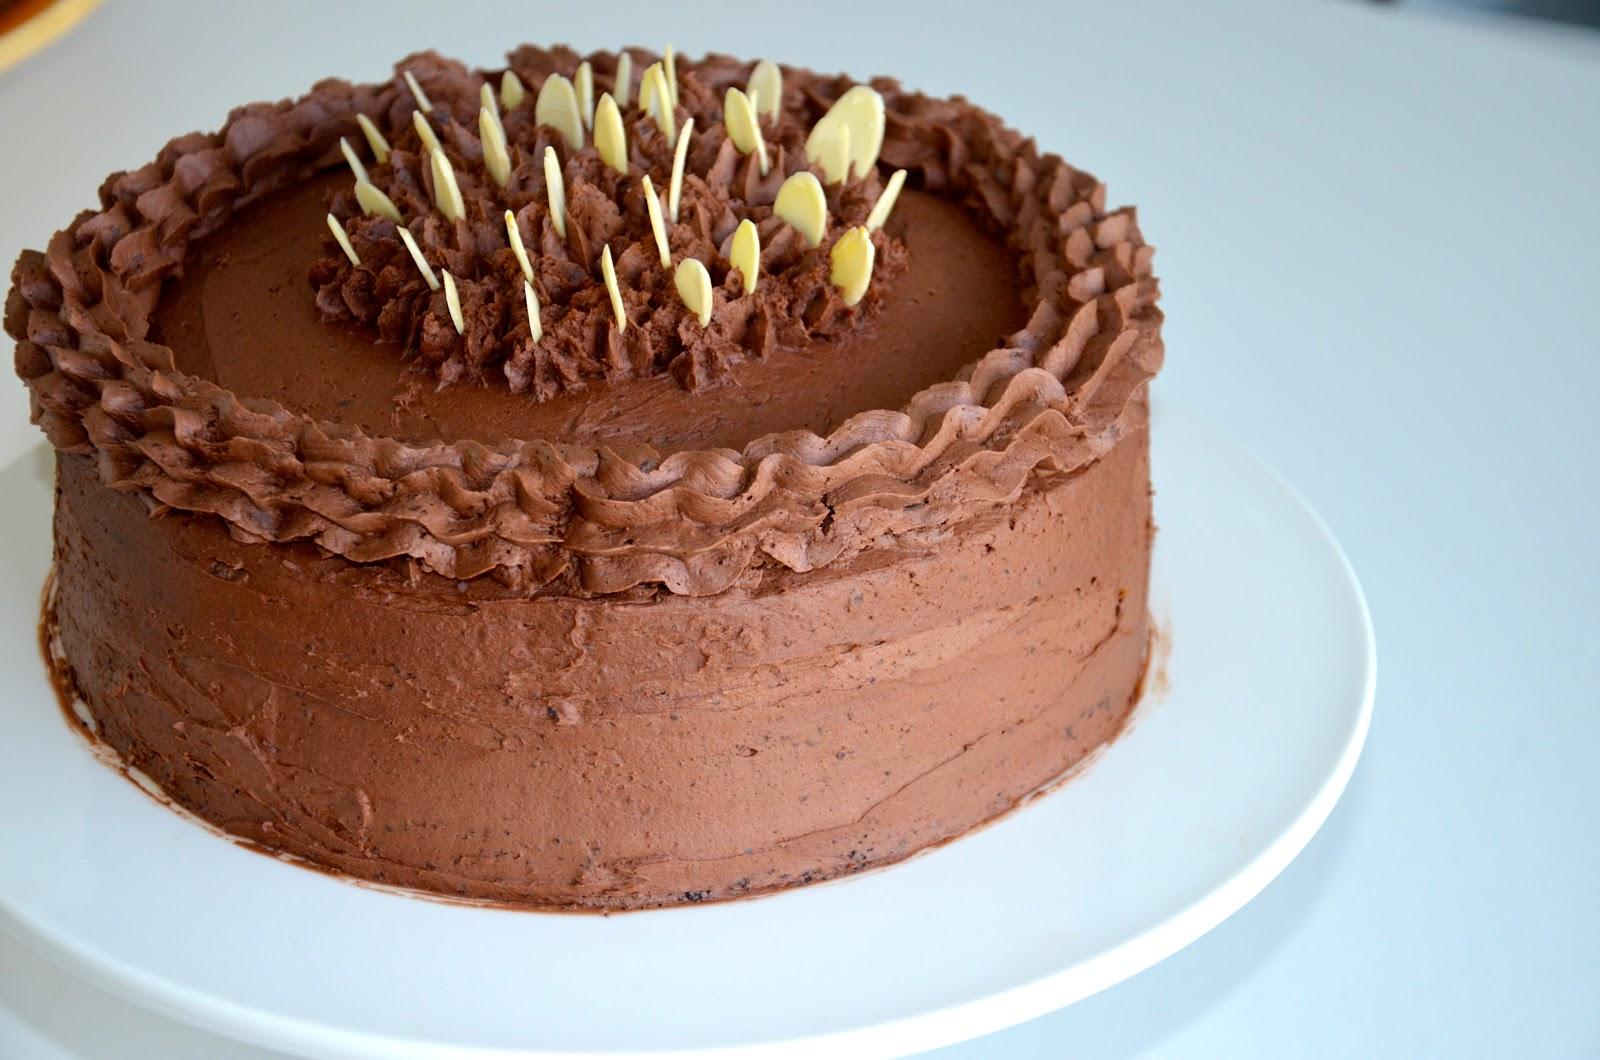 eat vegan: DECADENT VEGAN CHOCOLATE BIRTHDAY CAKE